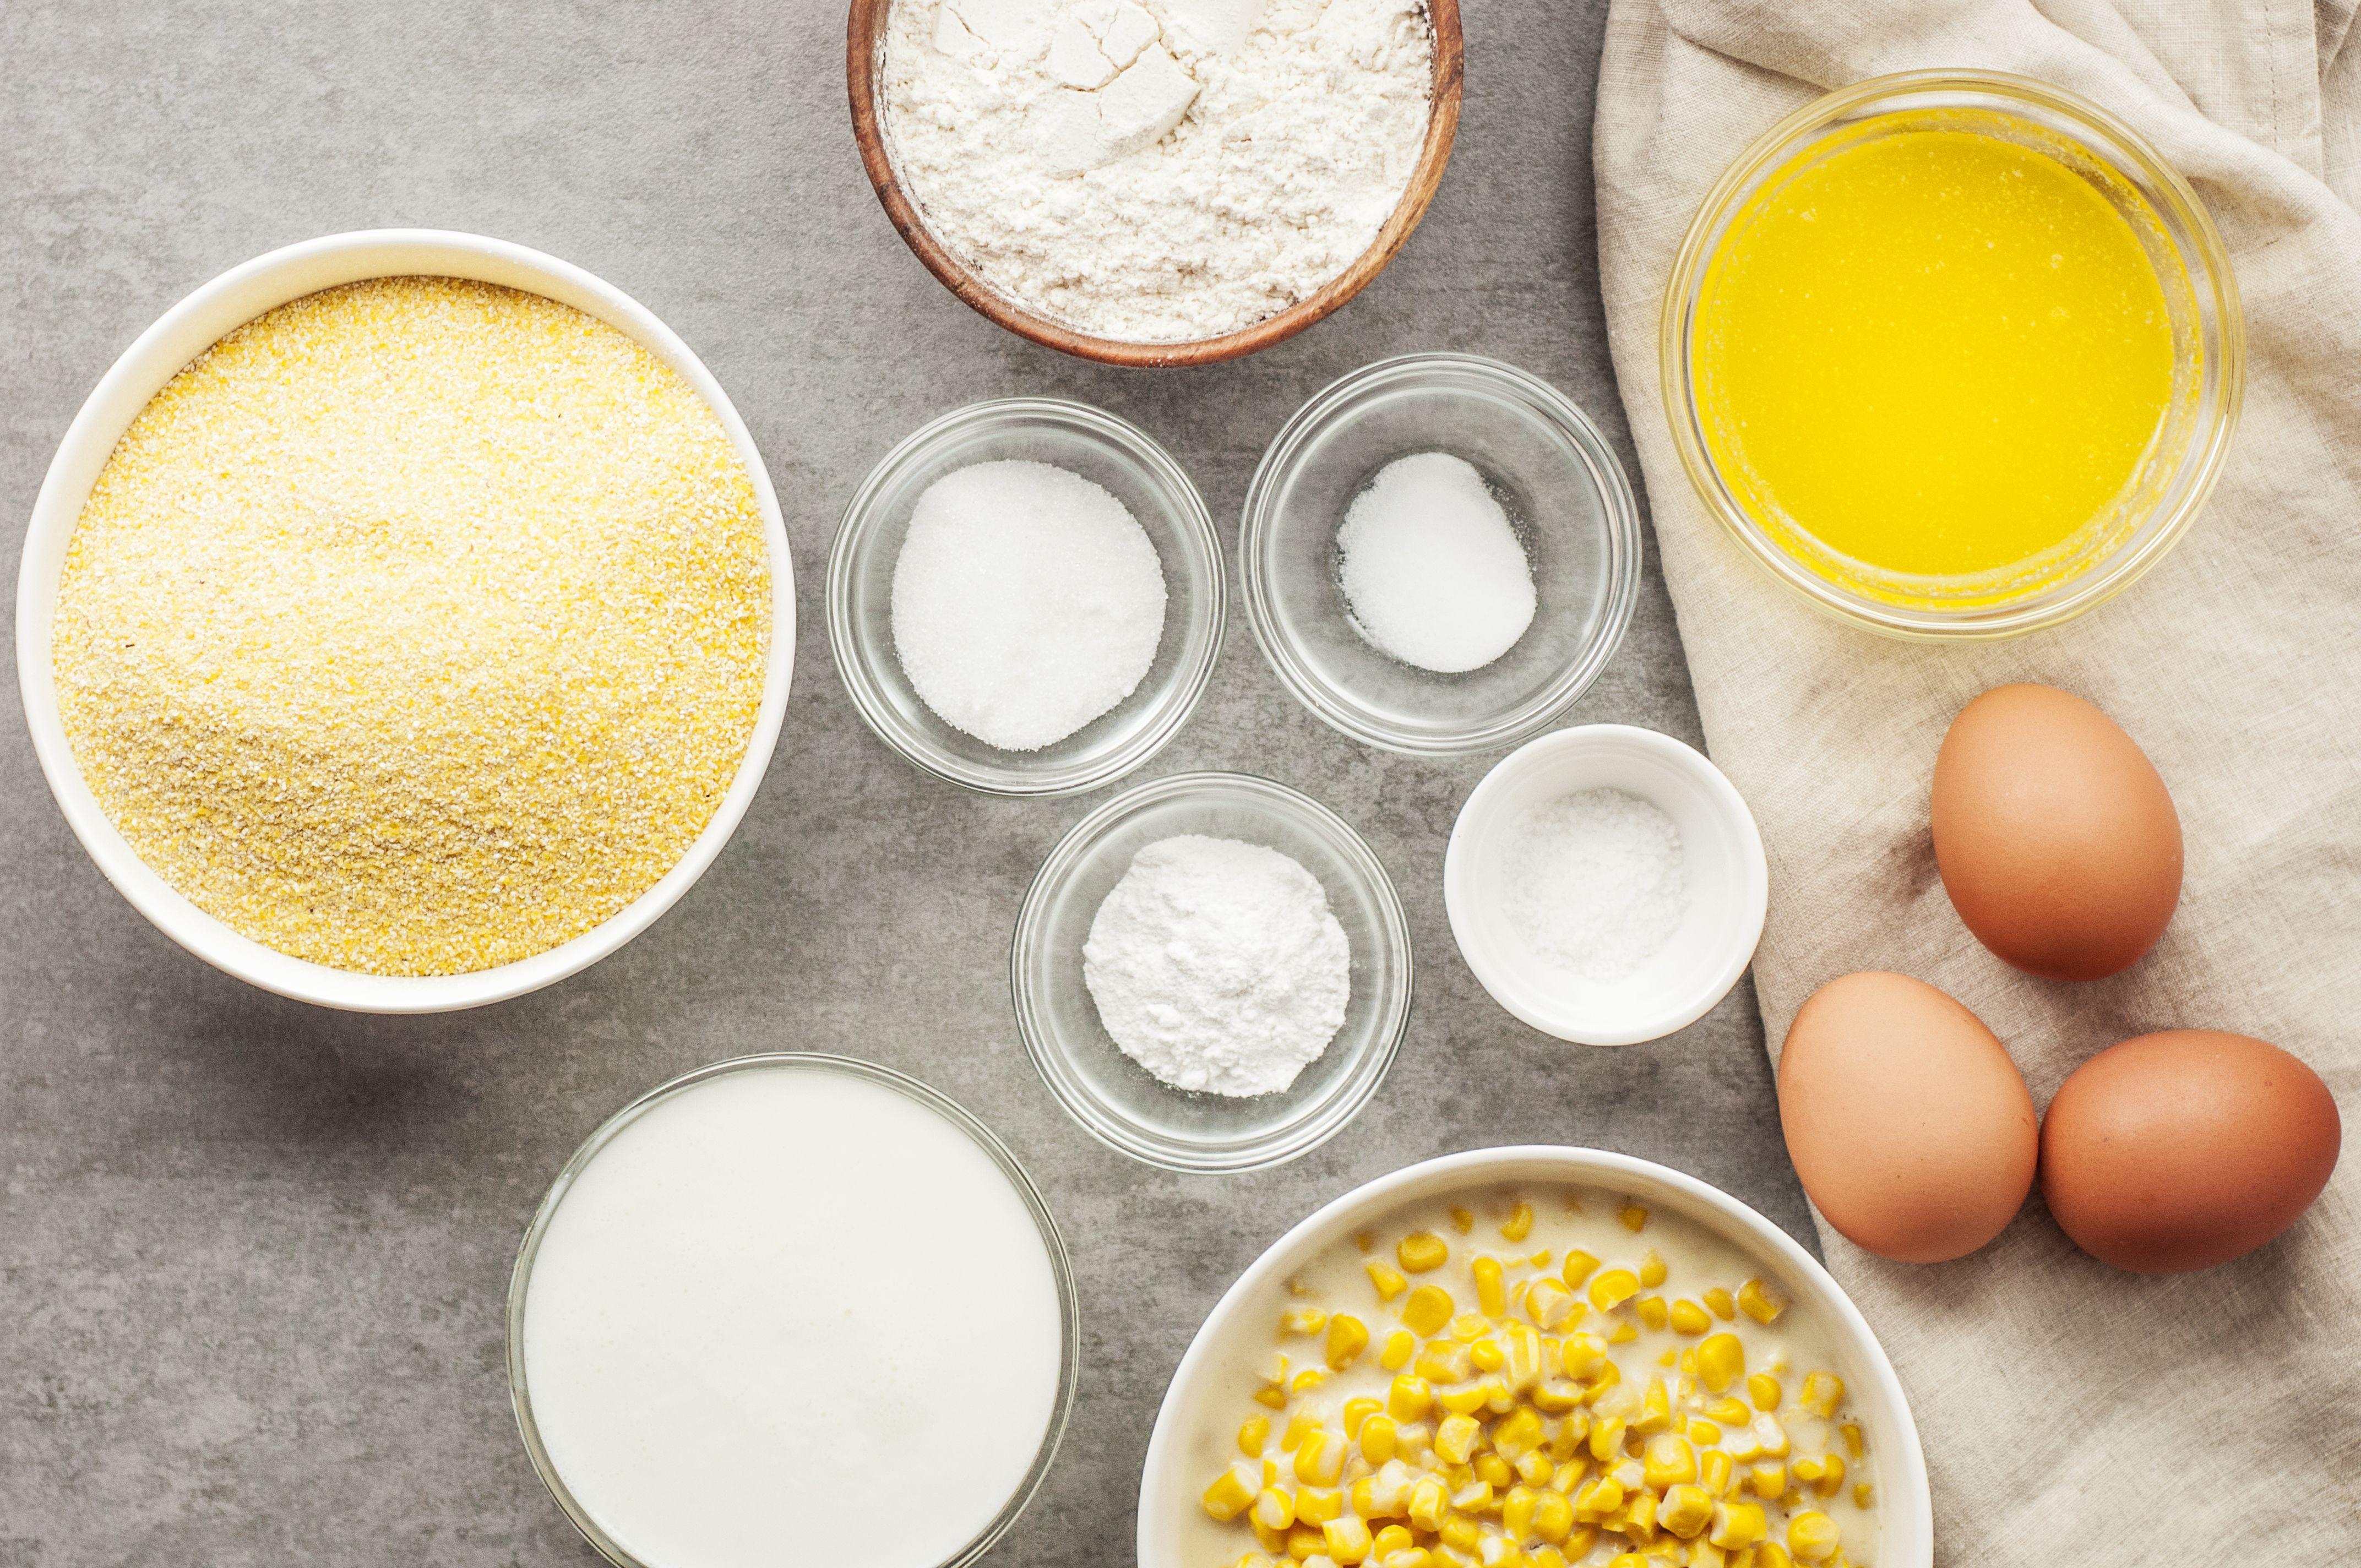 Moist Buttermilk Cornbread With Cream-Style Corn Ingredients